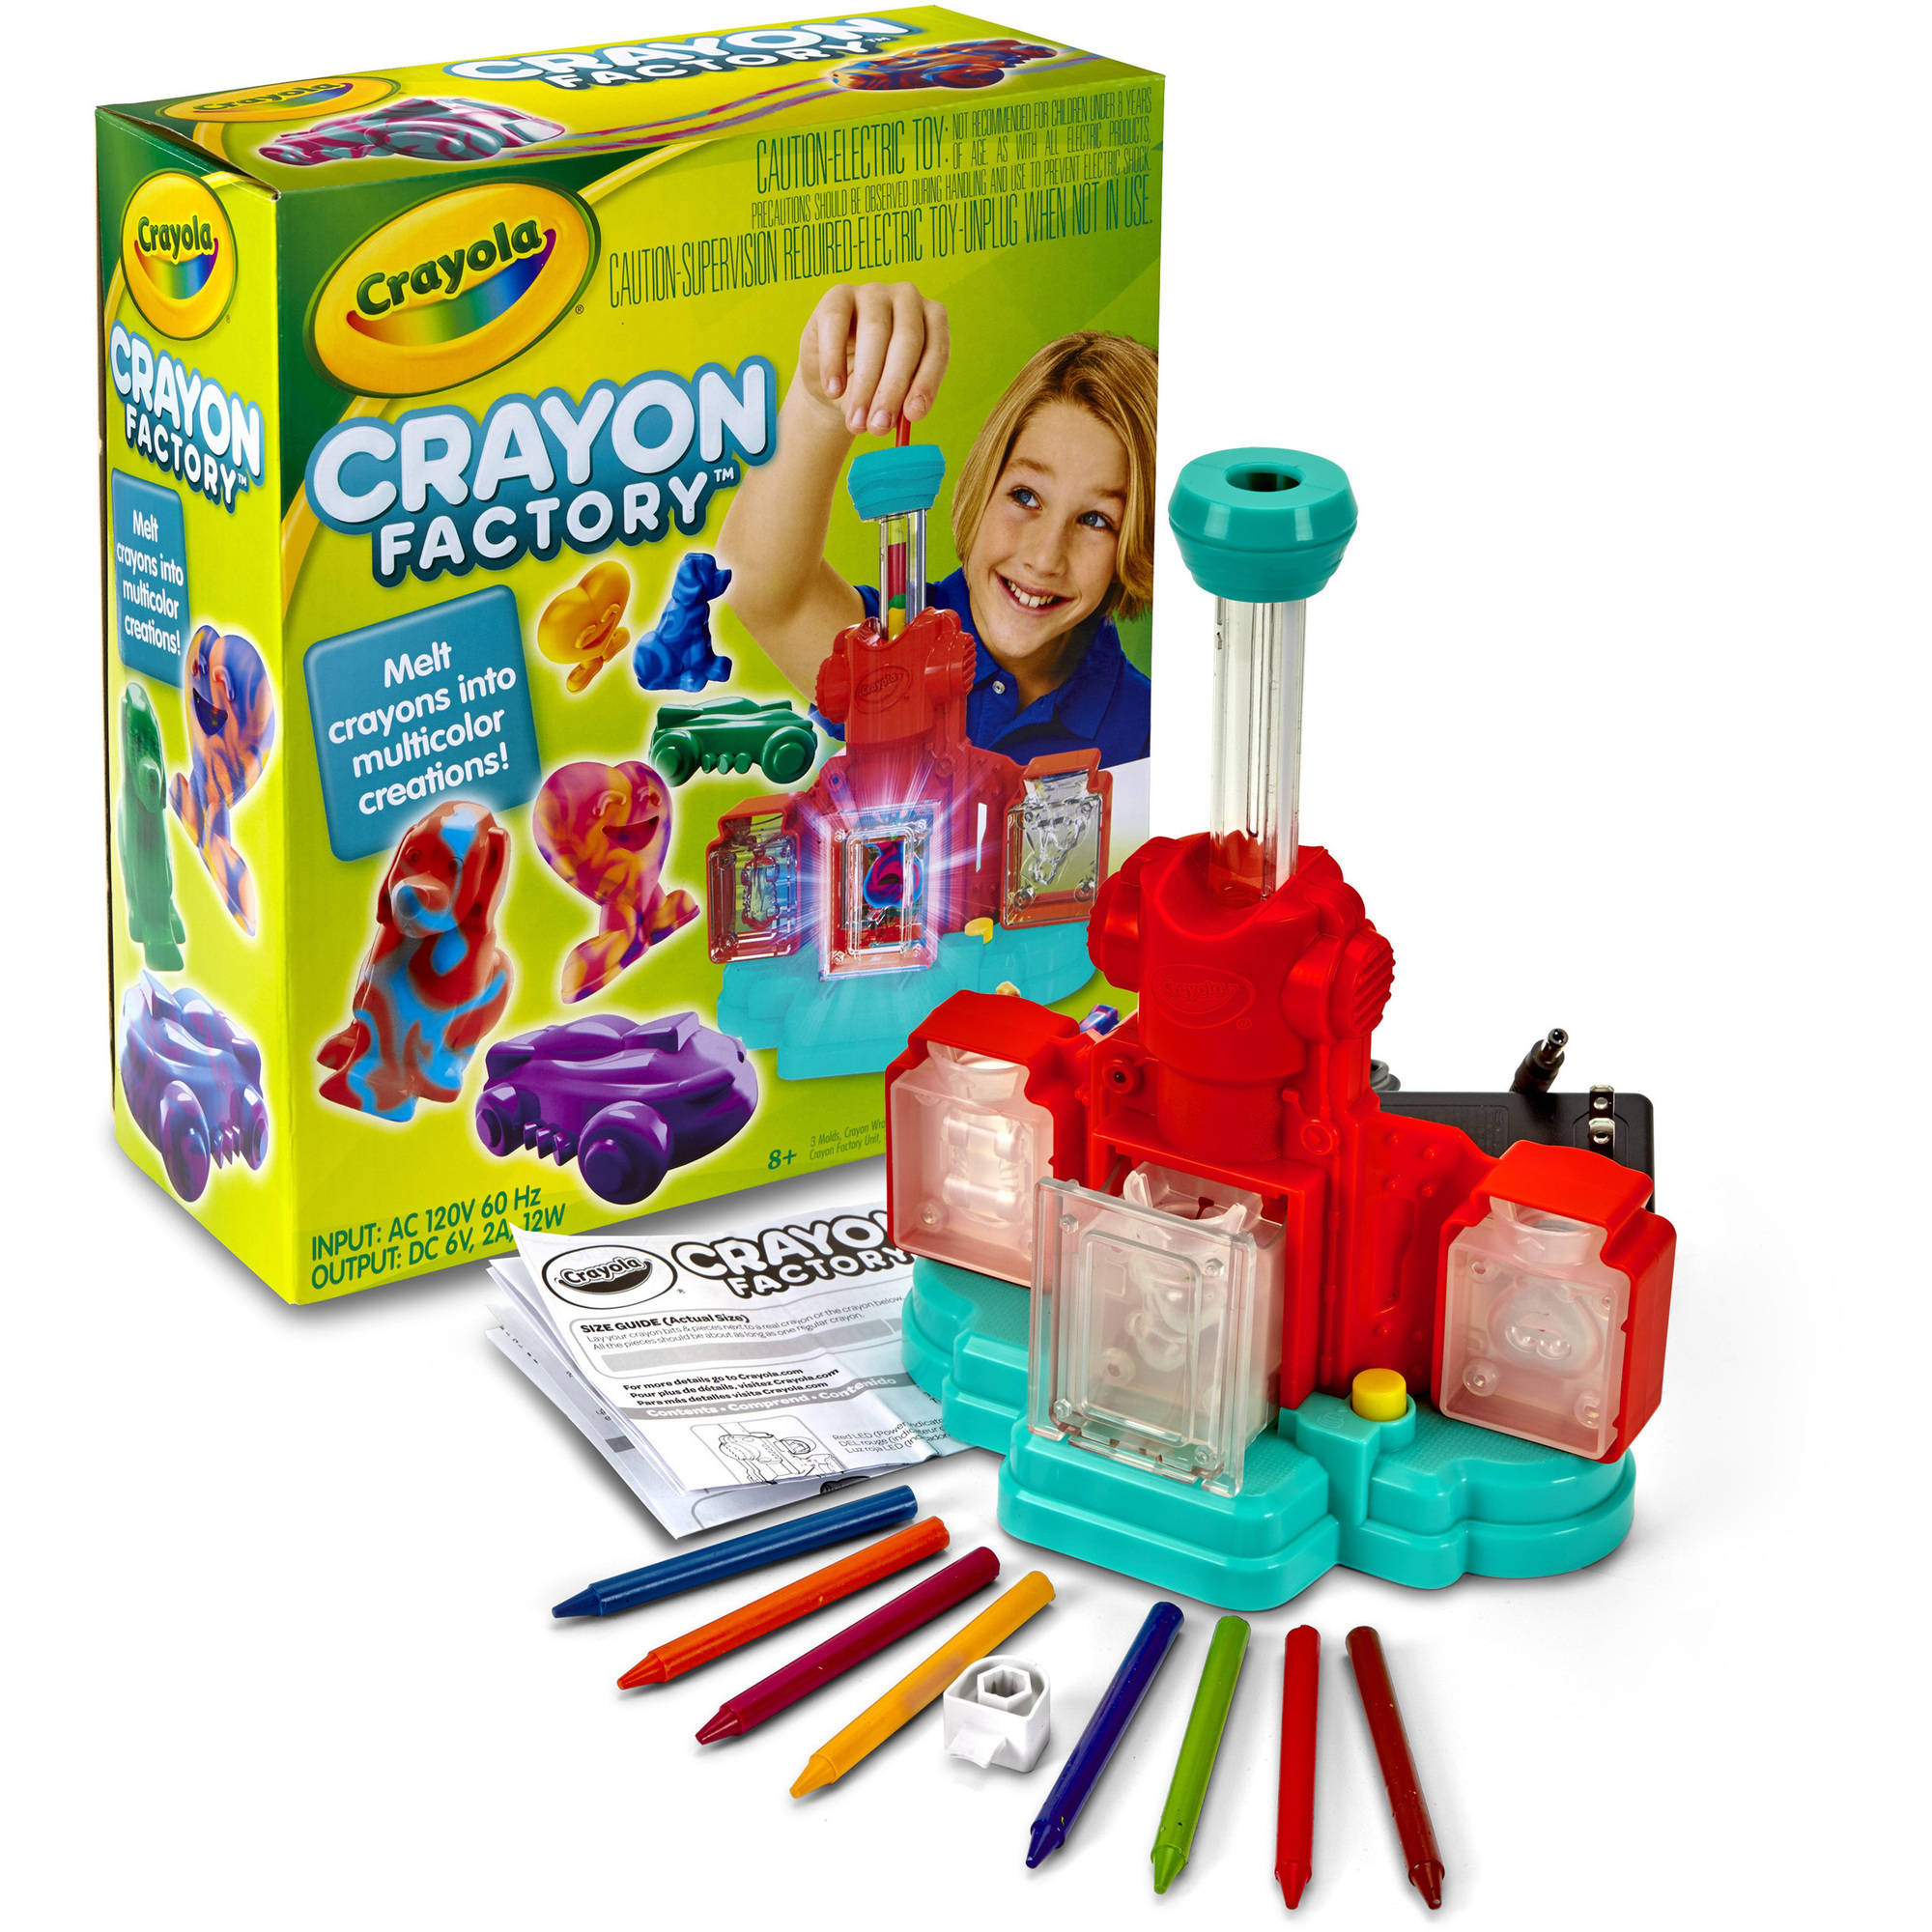 Crayola Crayon Factory for Kids